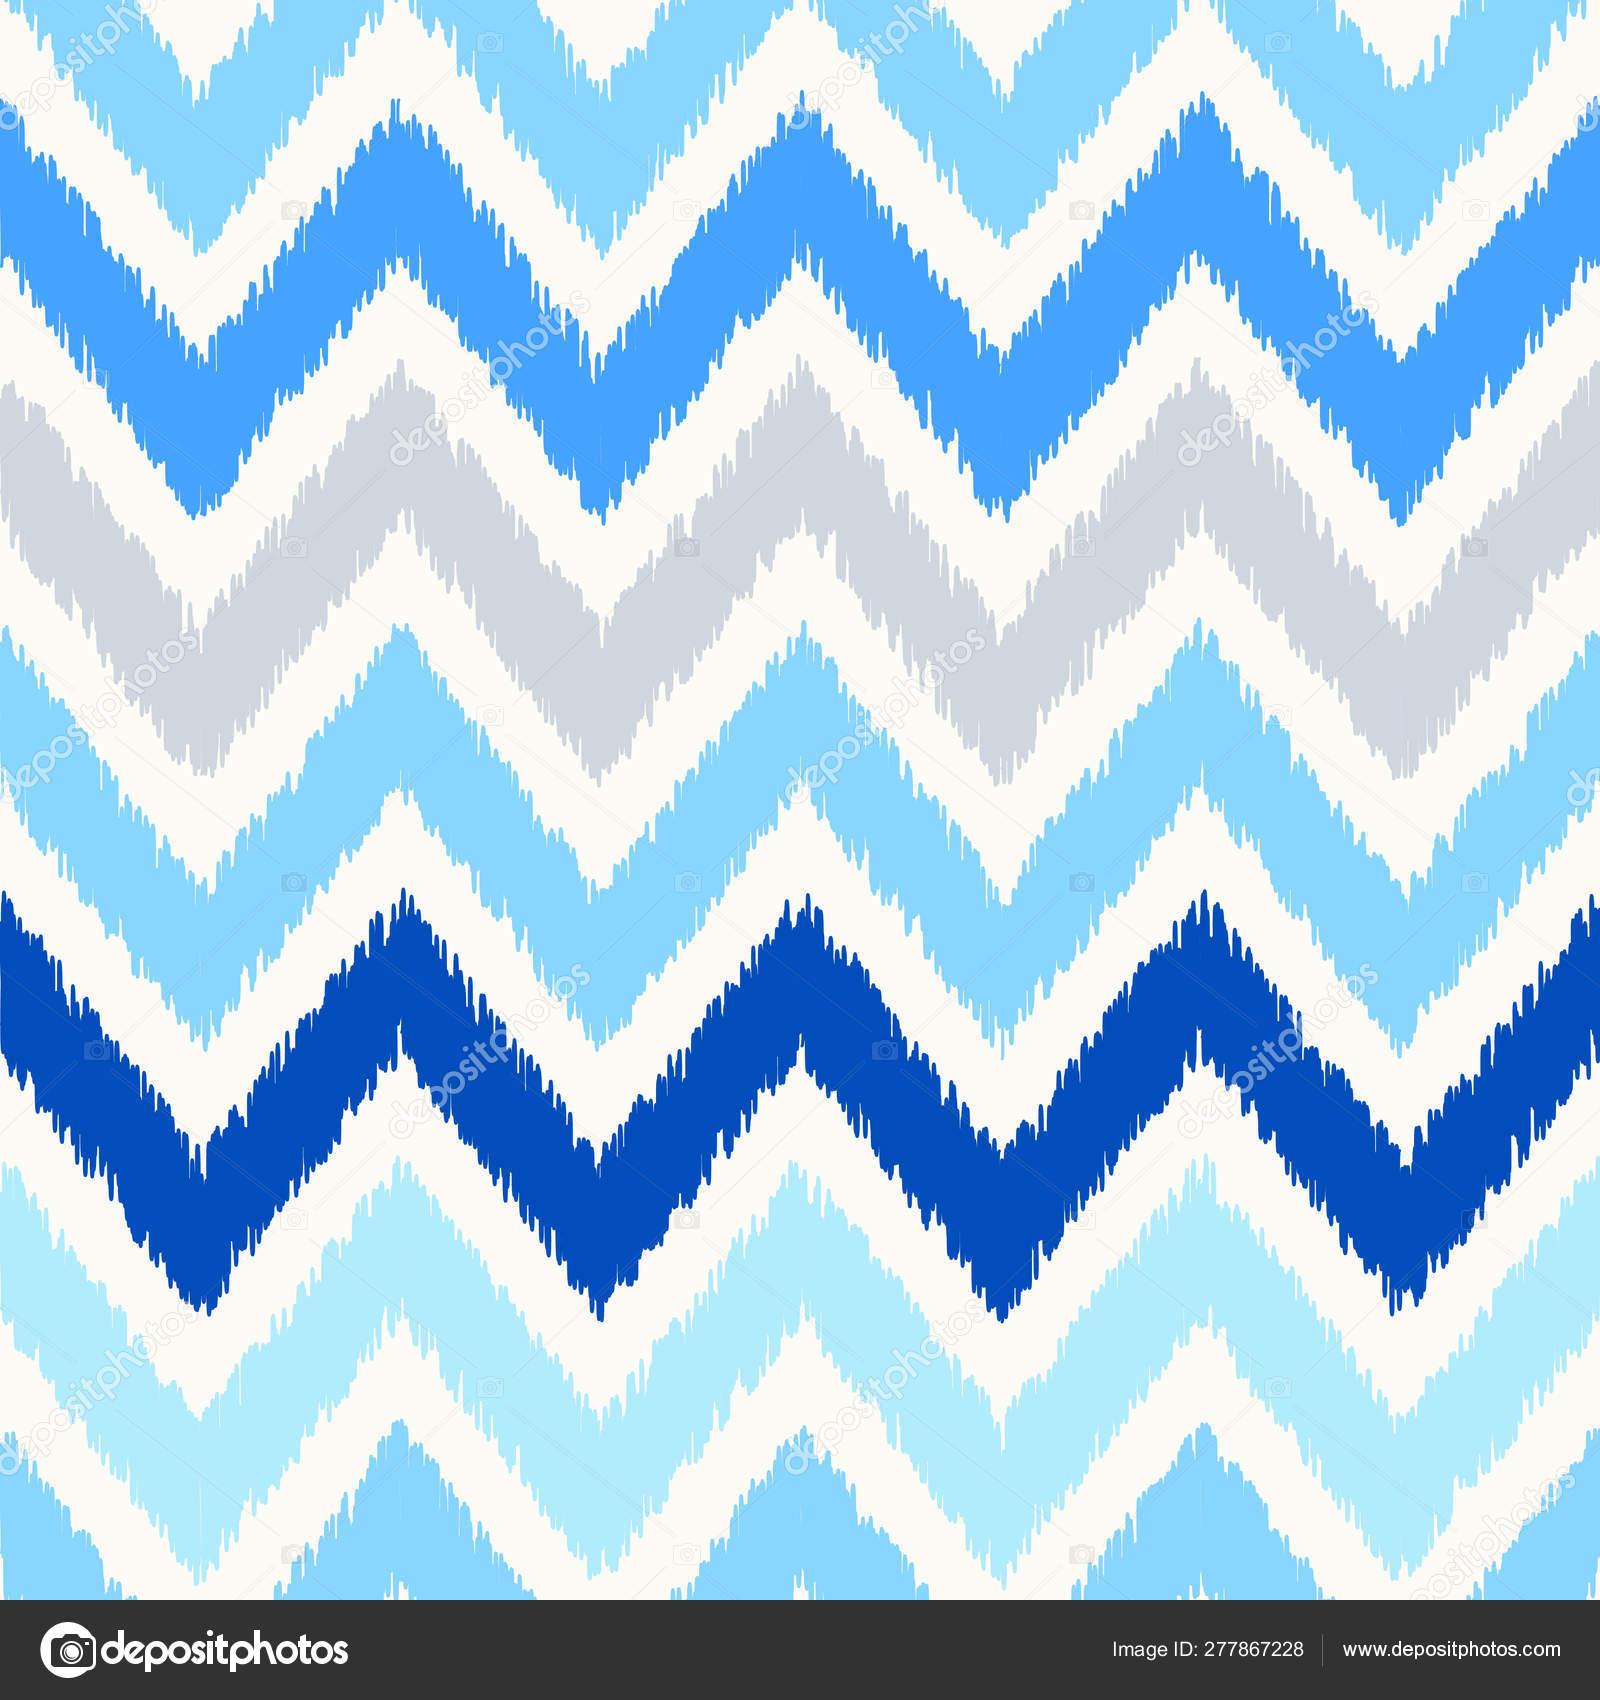 Uzbek Ikat Silk Fabric Pattern Indigo Blue And White Colors